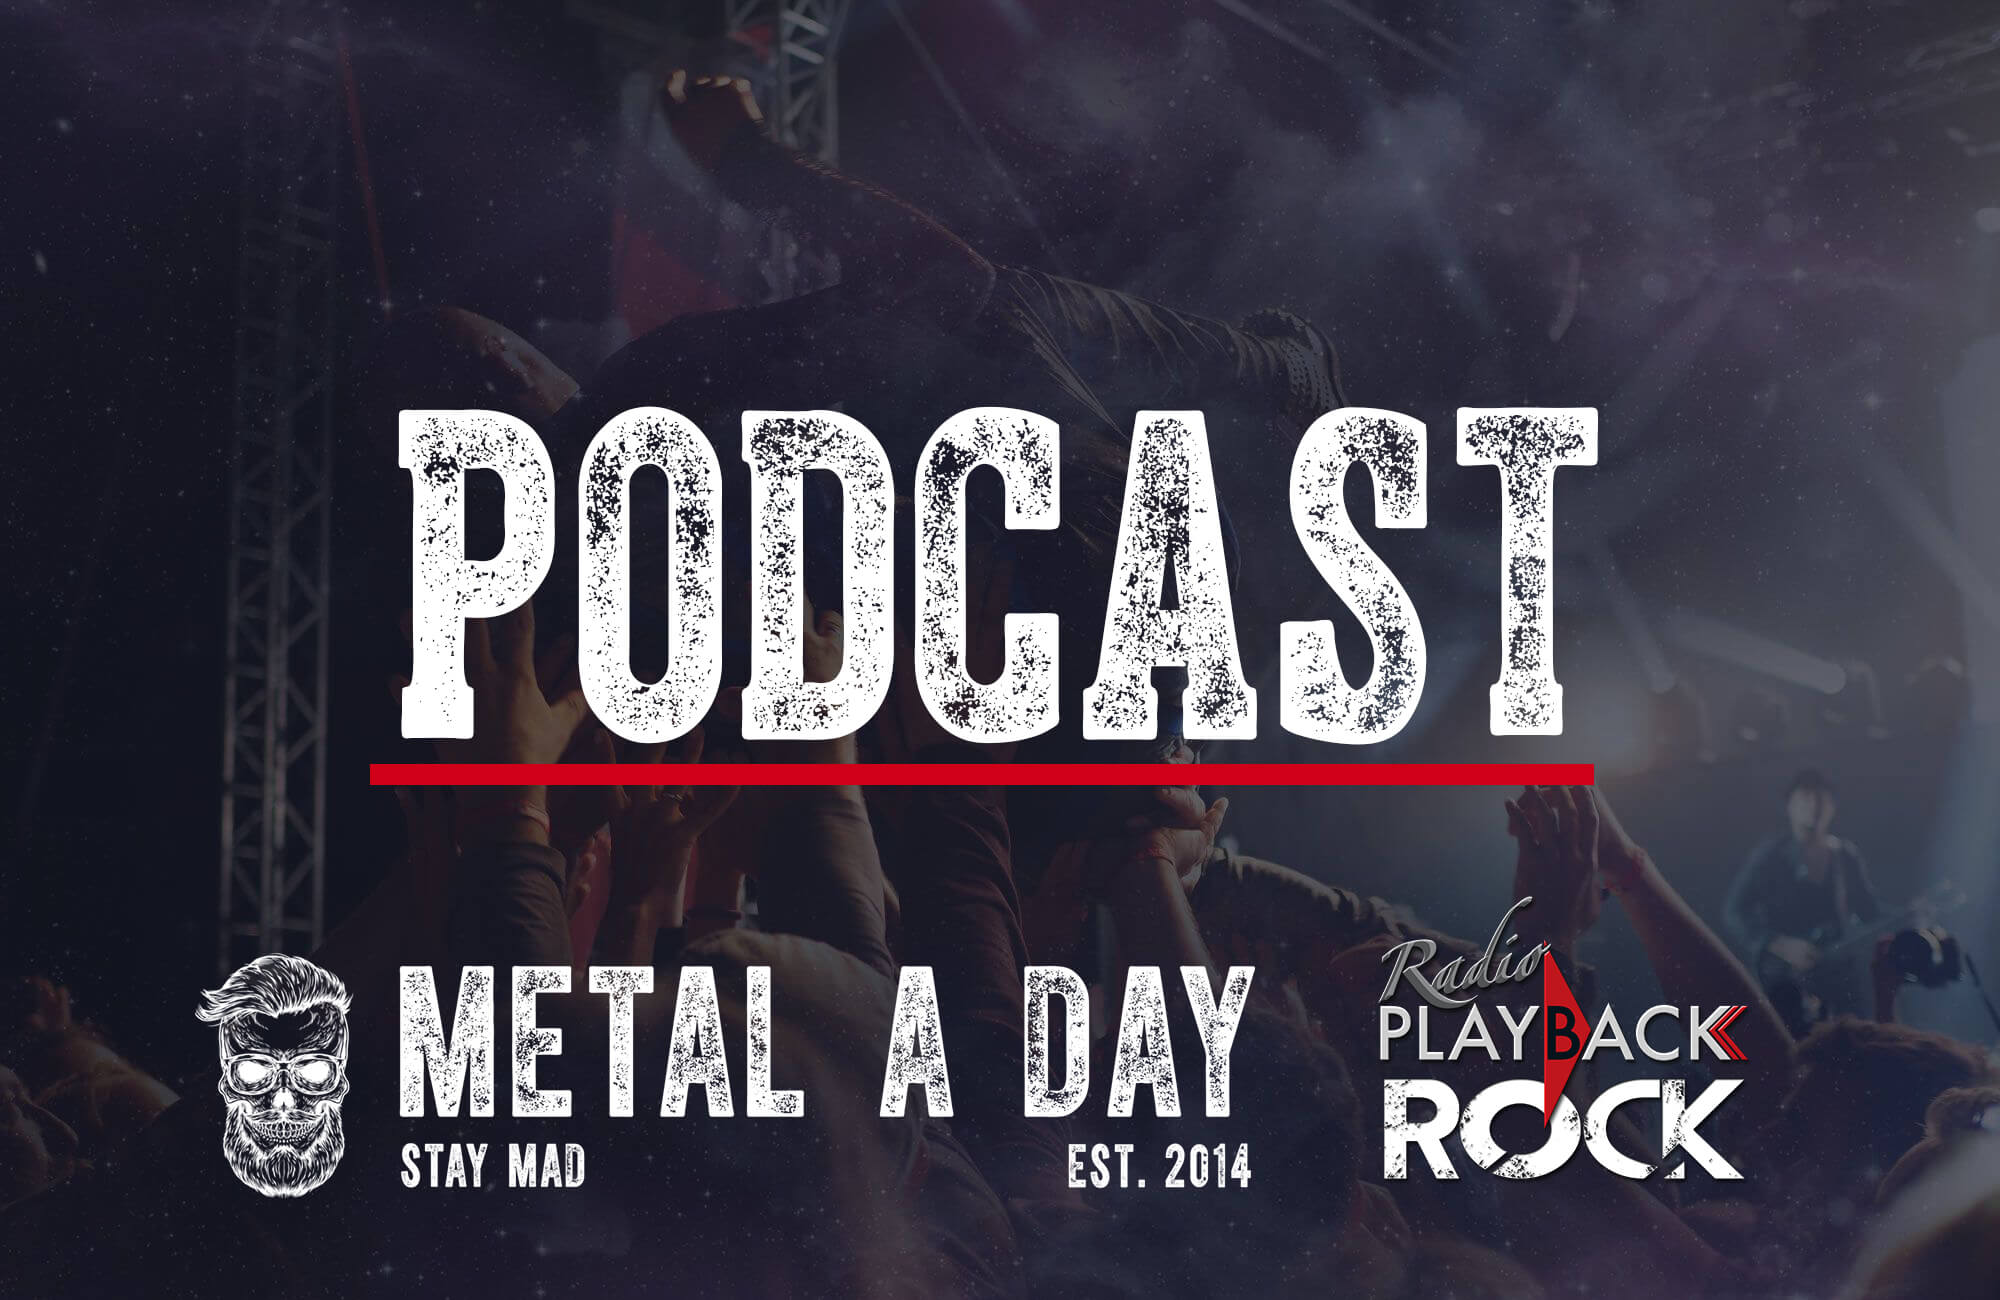 Radio Playback Rock & Metal A Day